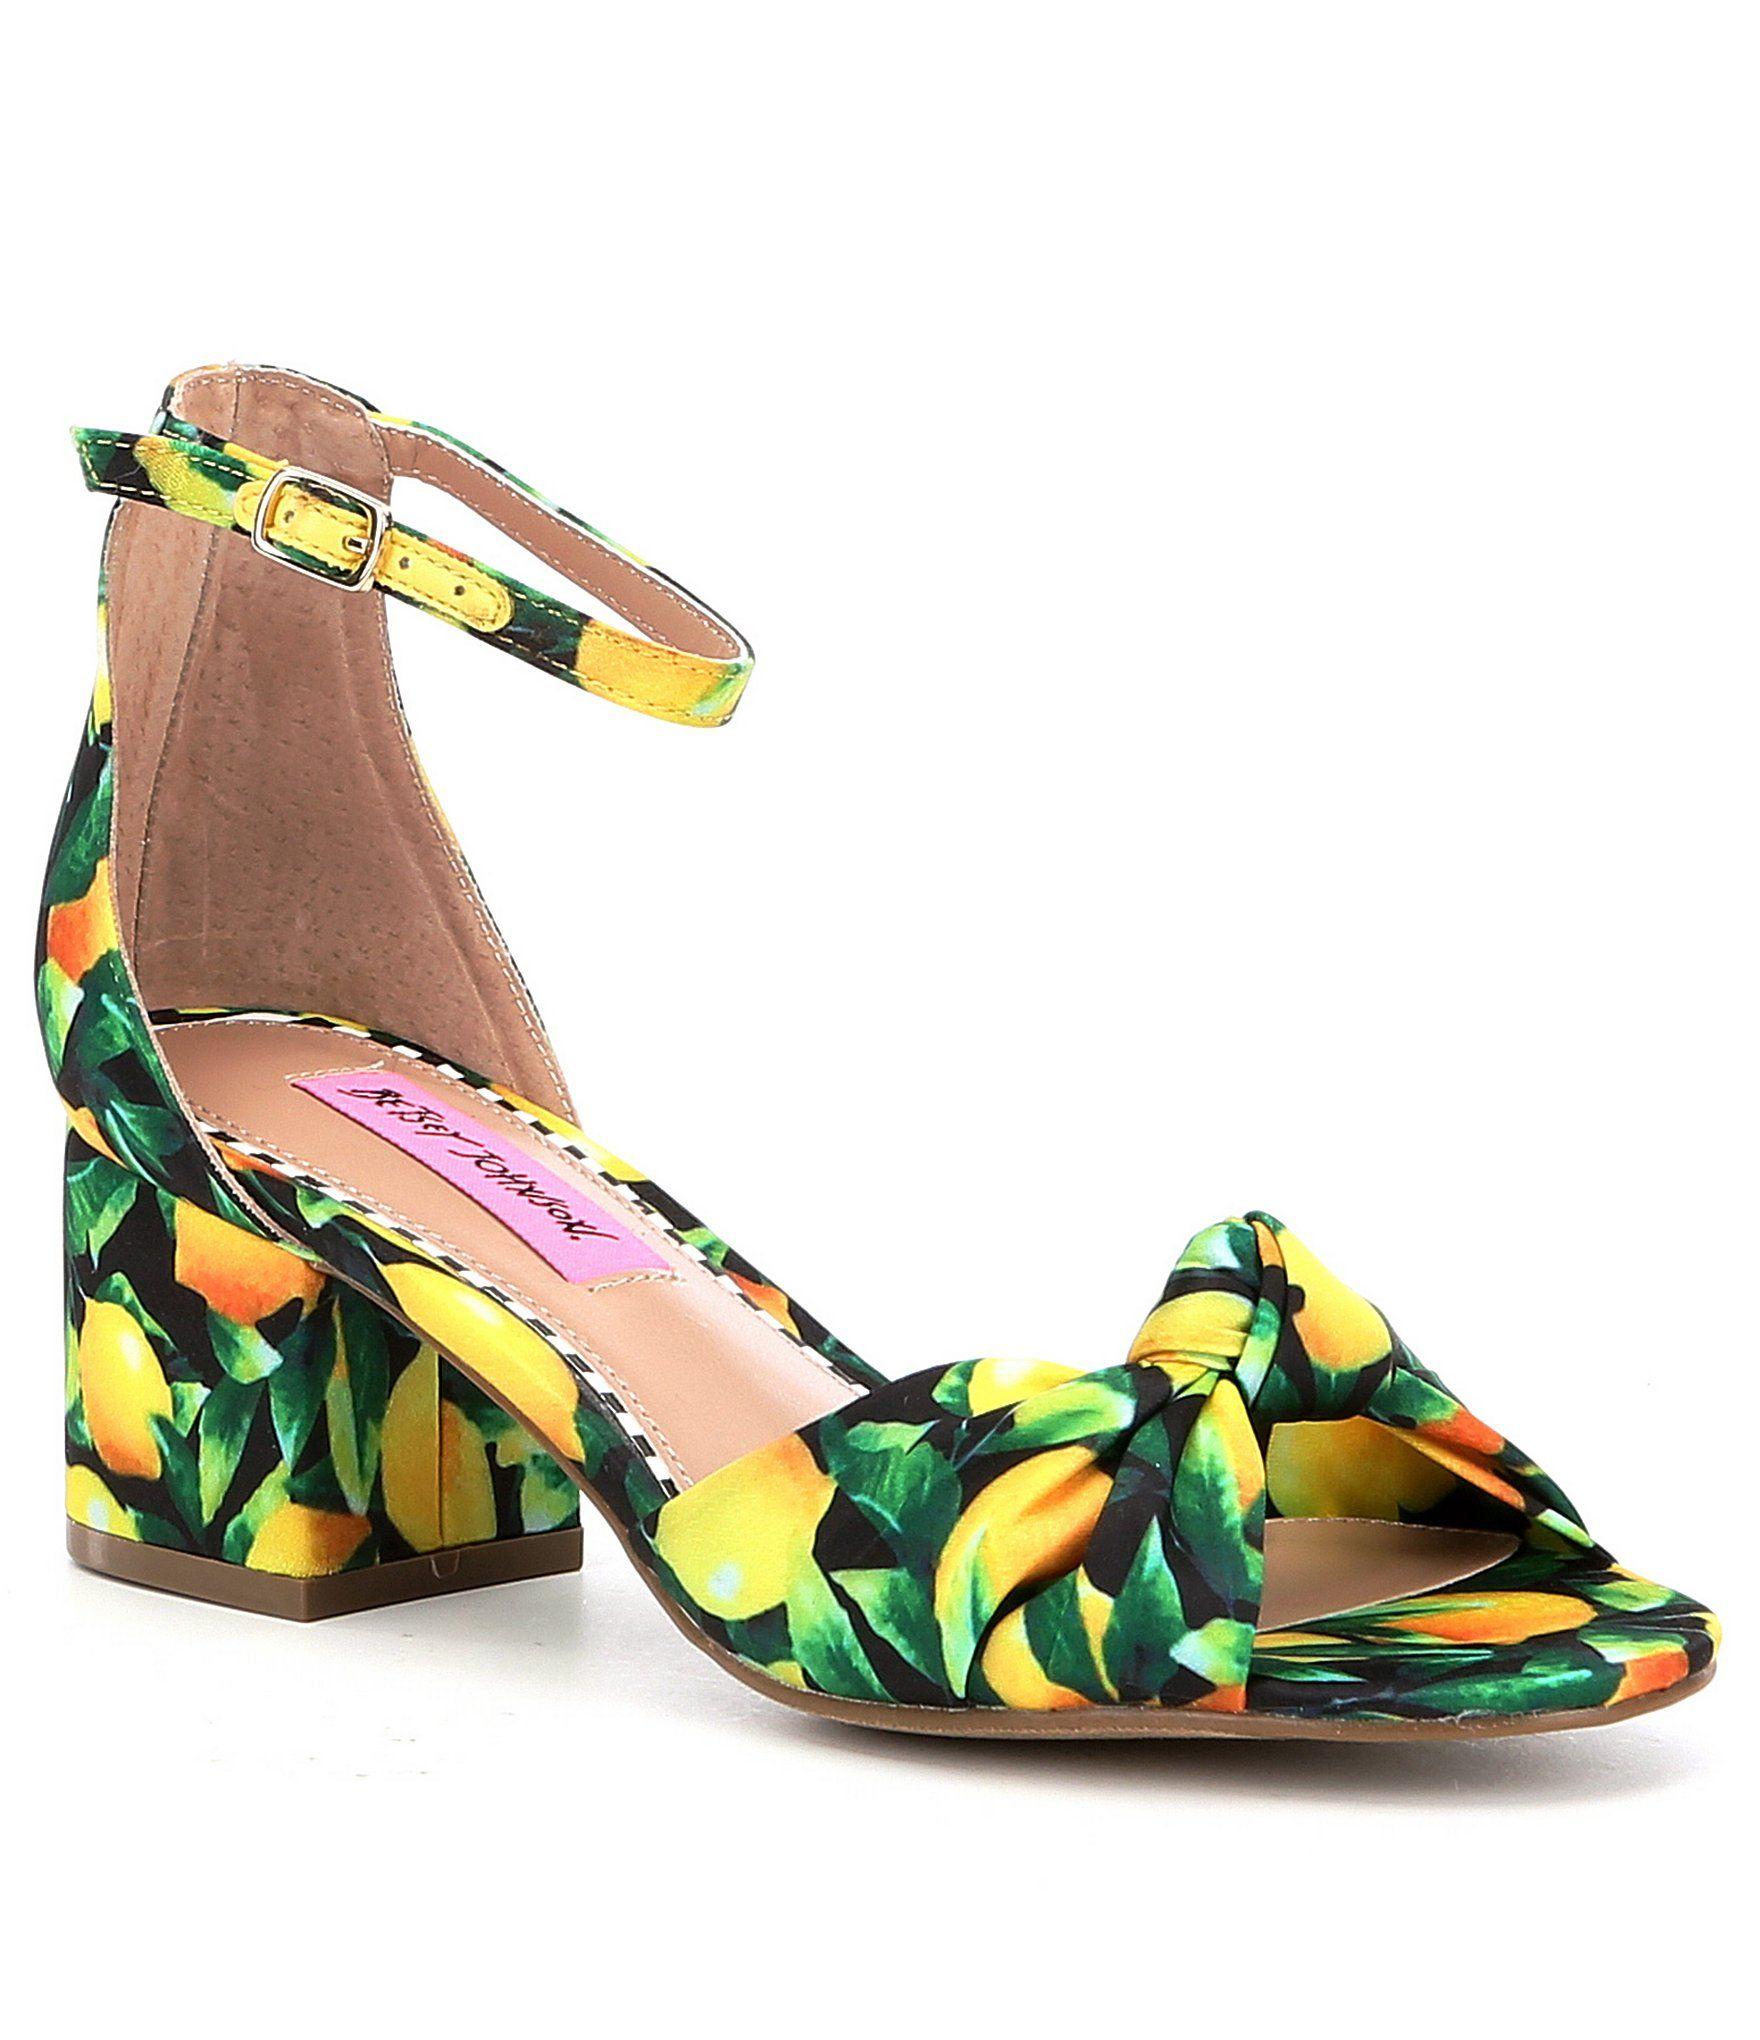 Betsey Johnson Ivee Lemon-Print Ankle Strap Block Heel Sandals   Dillards